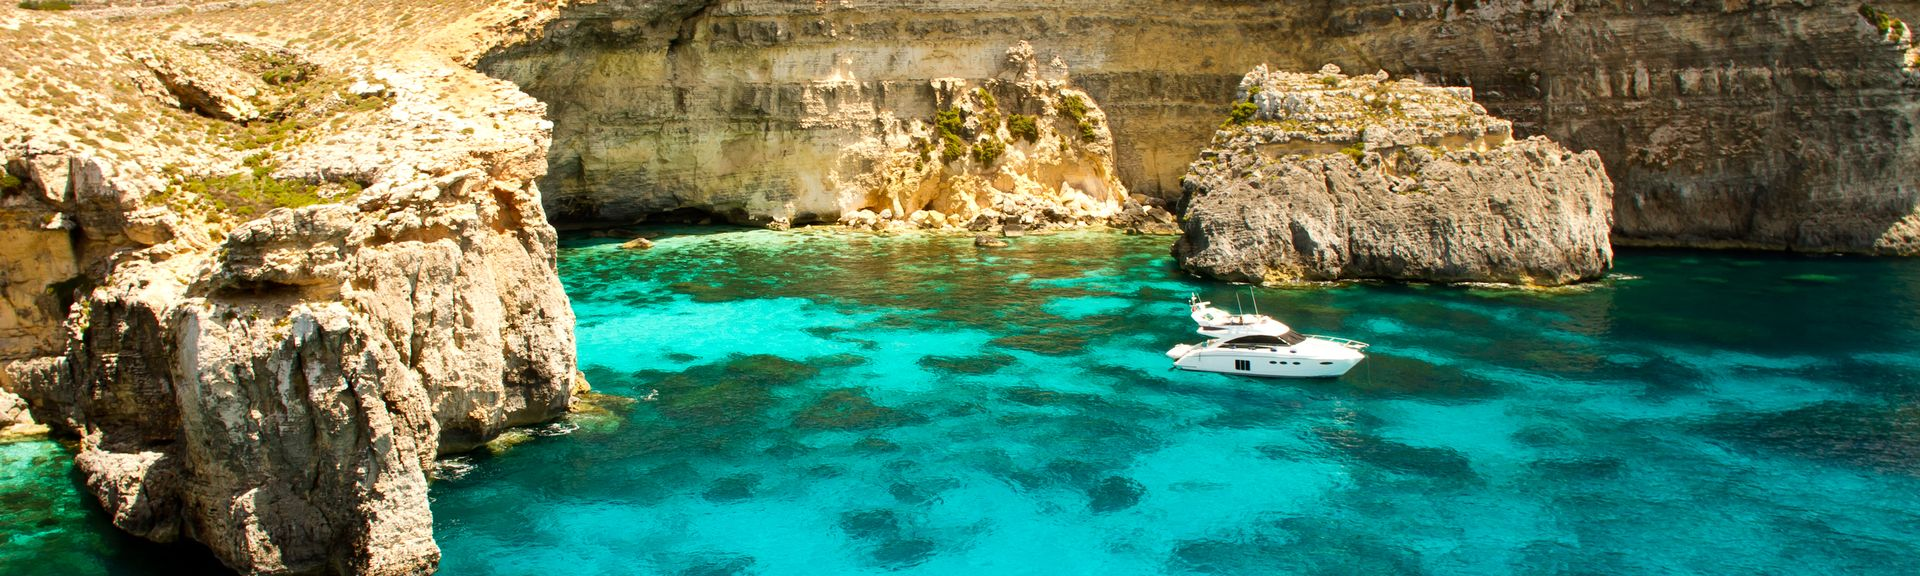 Bugibba, St. Paul's Bay, Malta